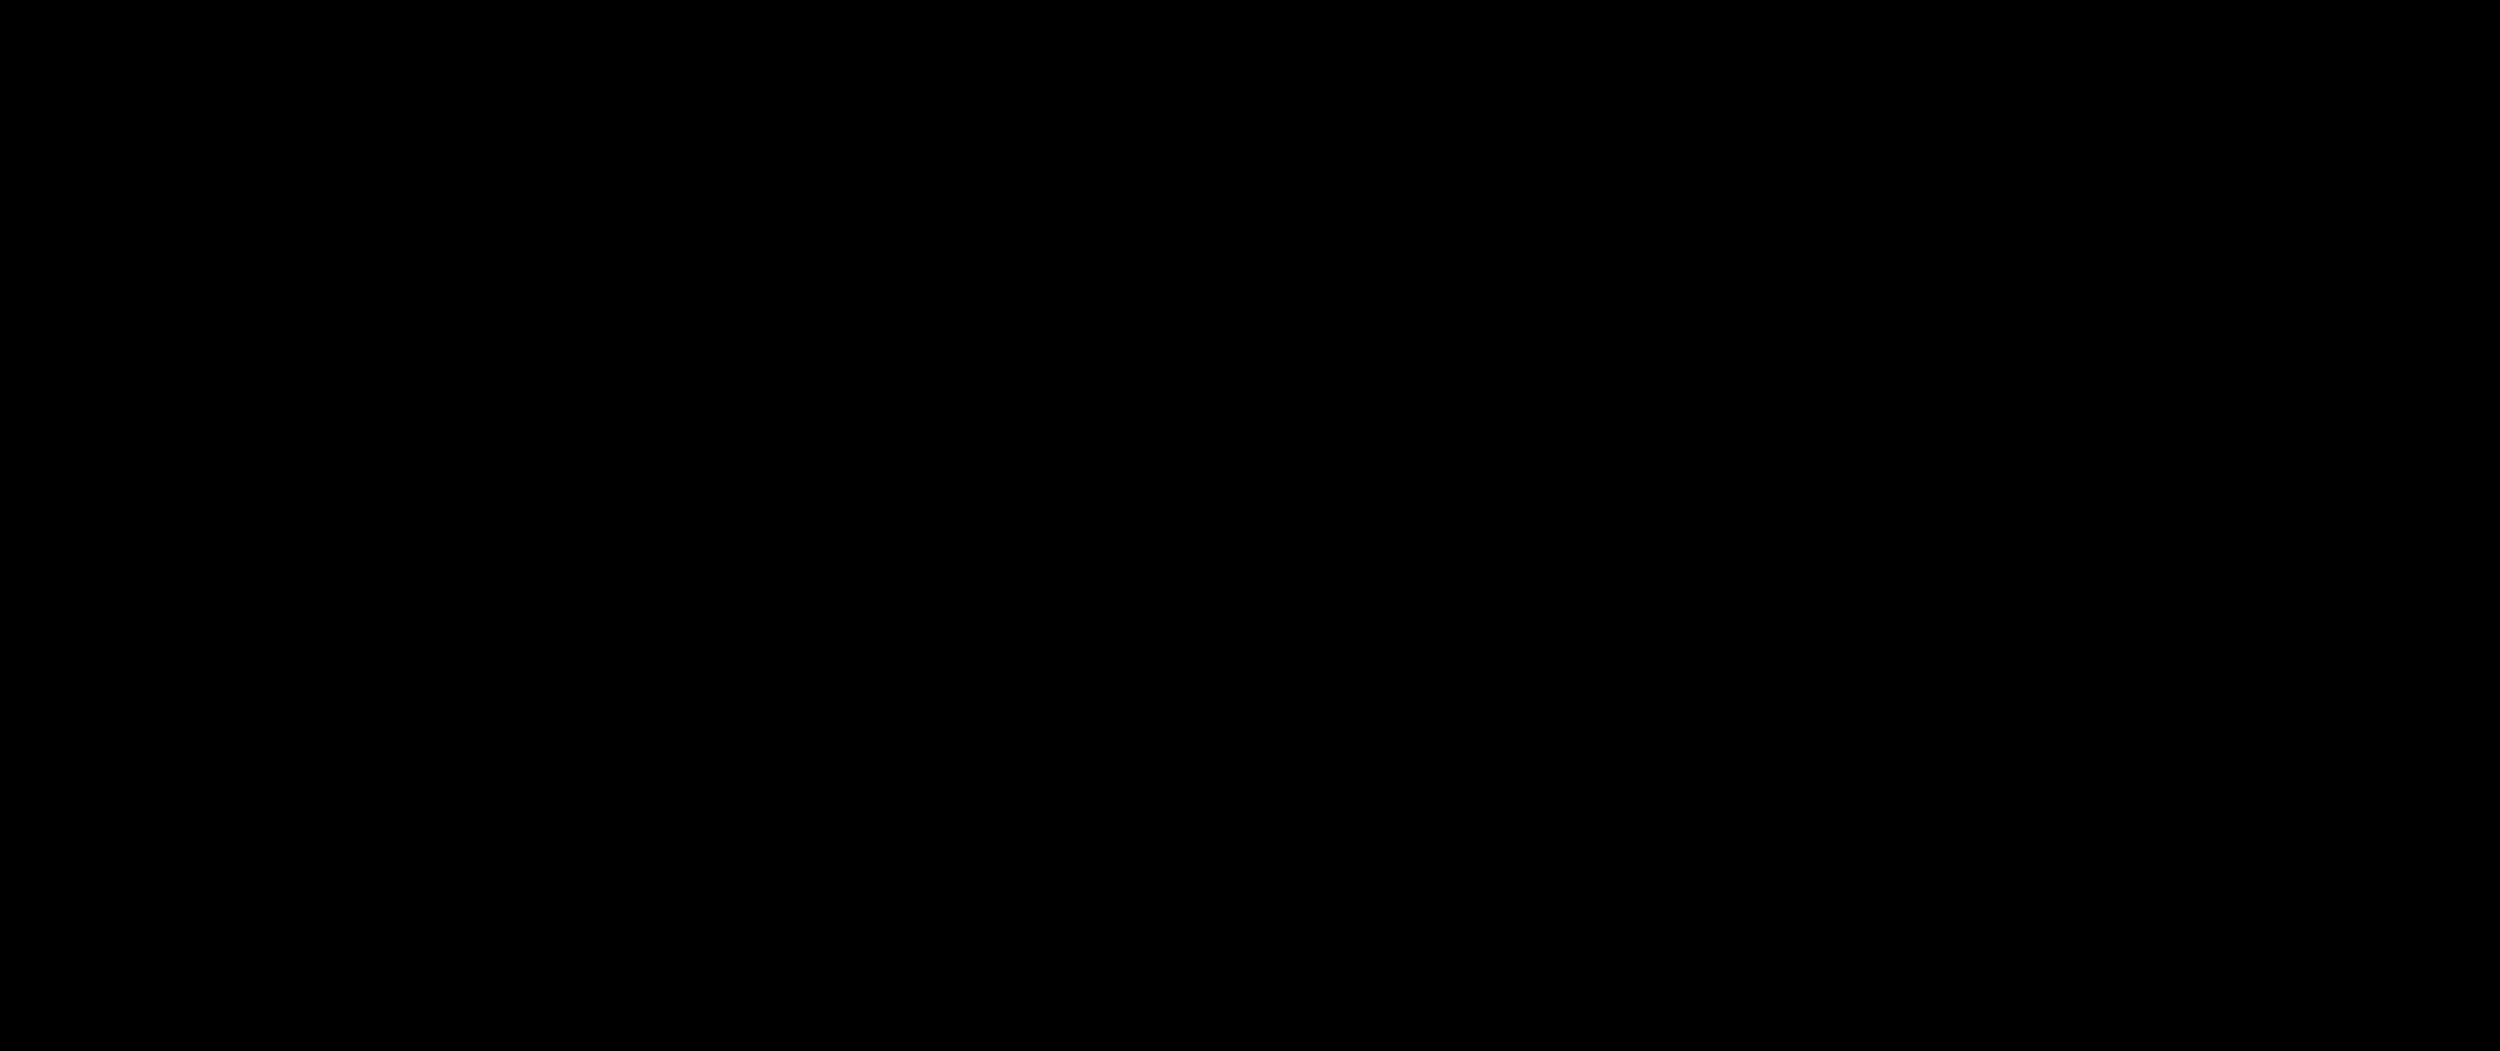 crysalis-lady-02.png